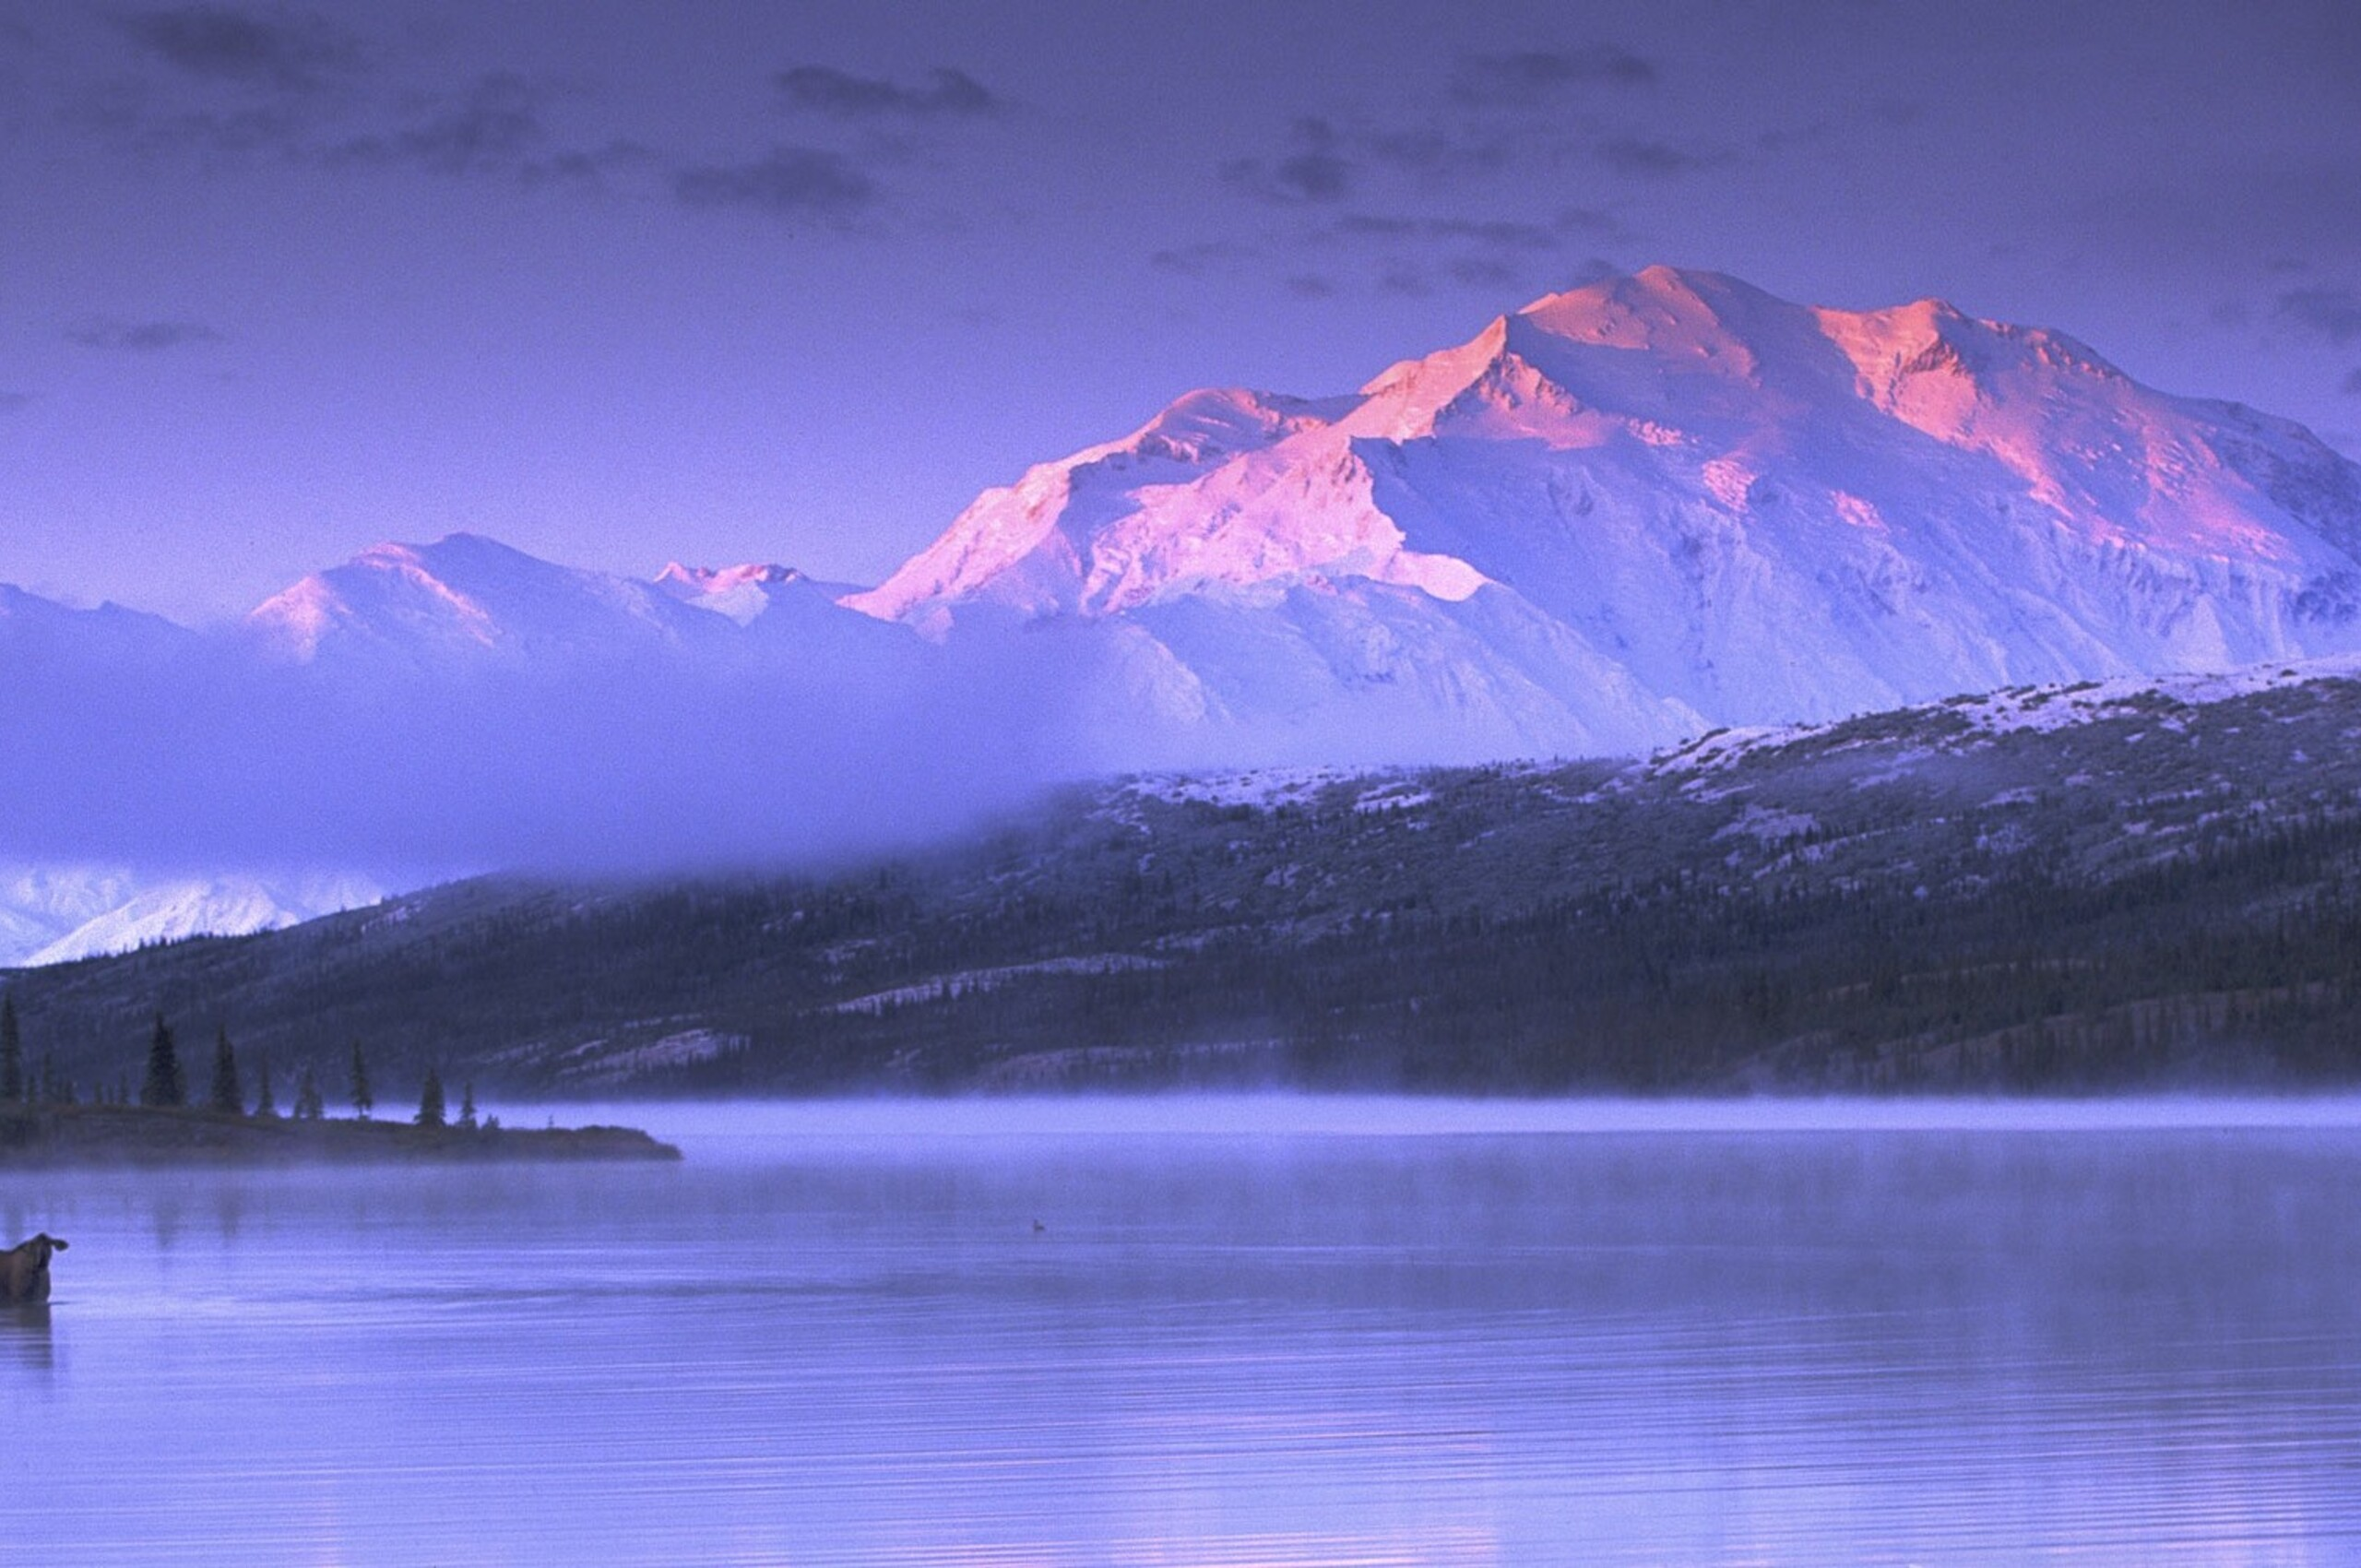 Alaska Landscape Mountains Pic